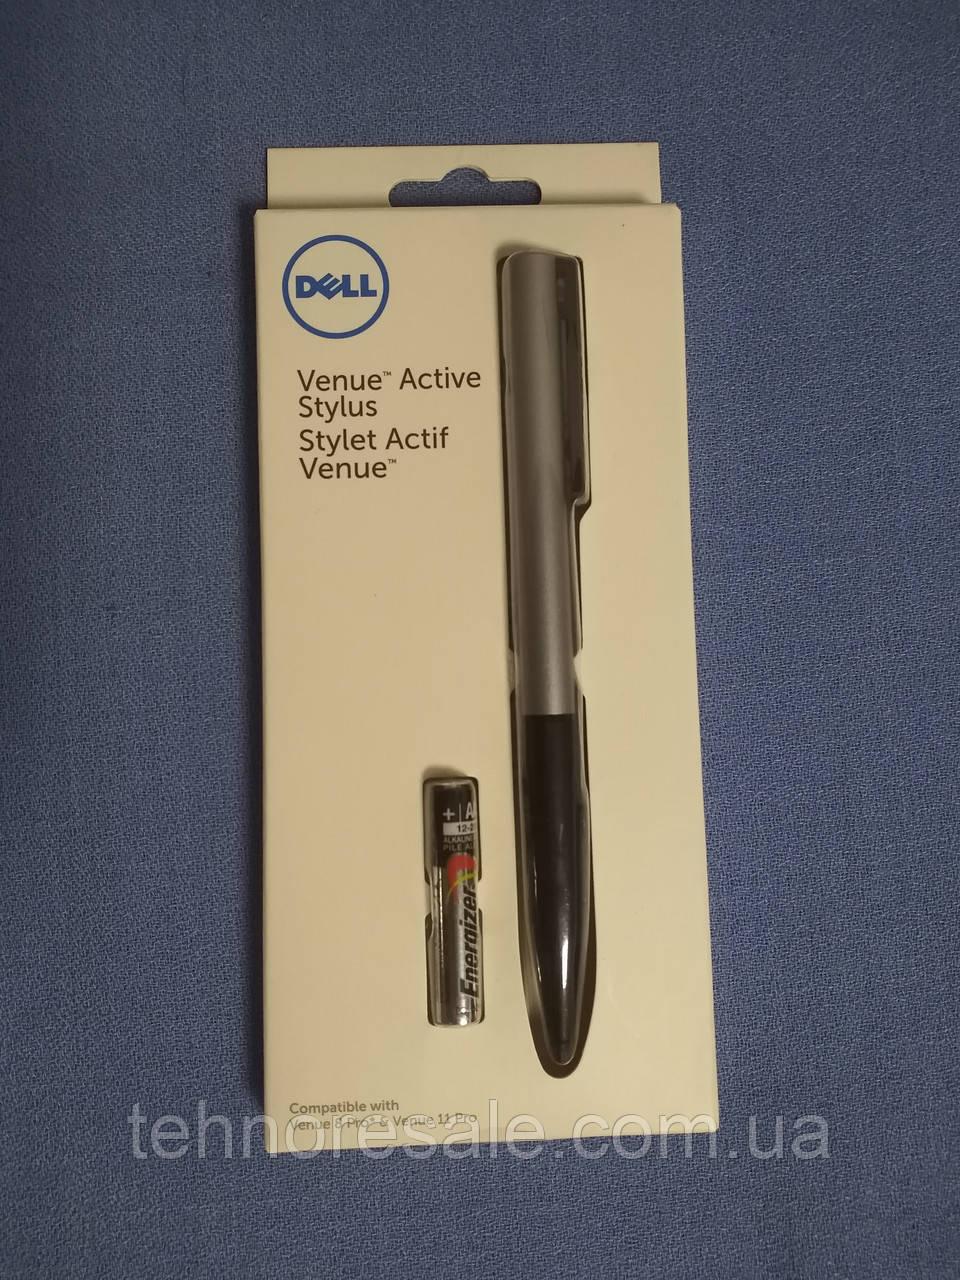 Активний стилус Dell Venue Pro 8/11 для планшета Dell 7130, 7140, 7139, 5130